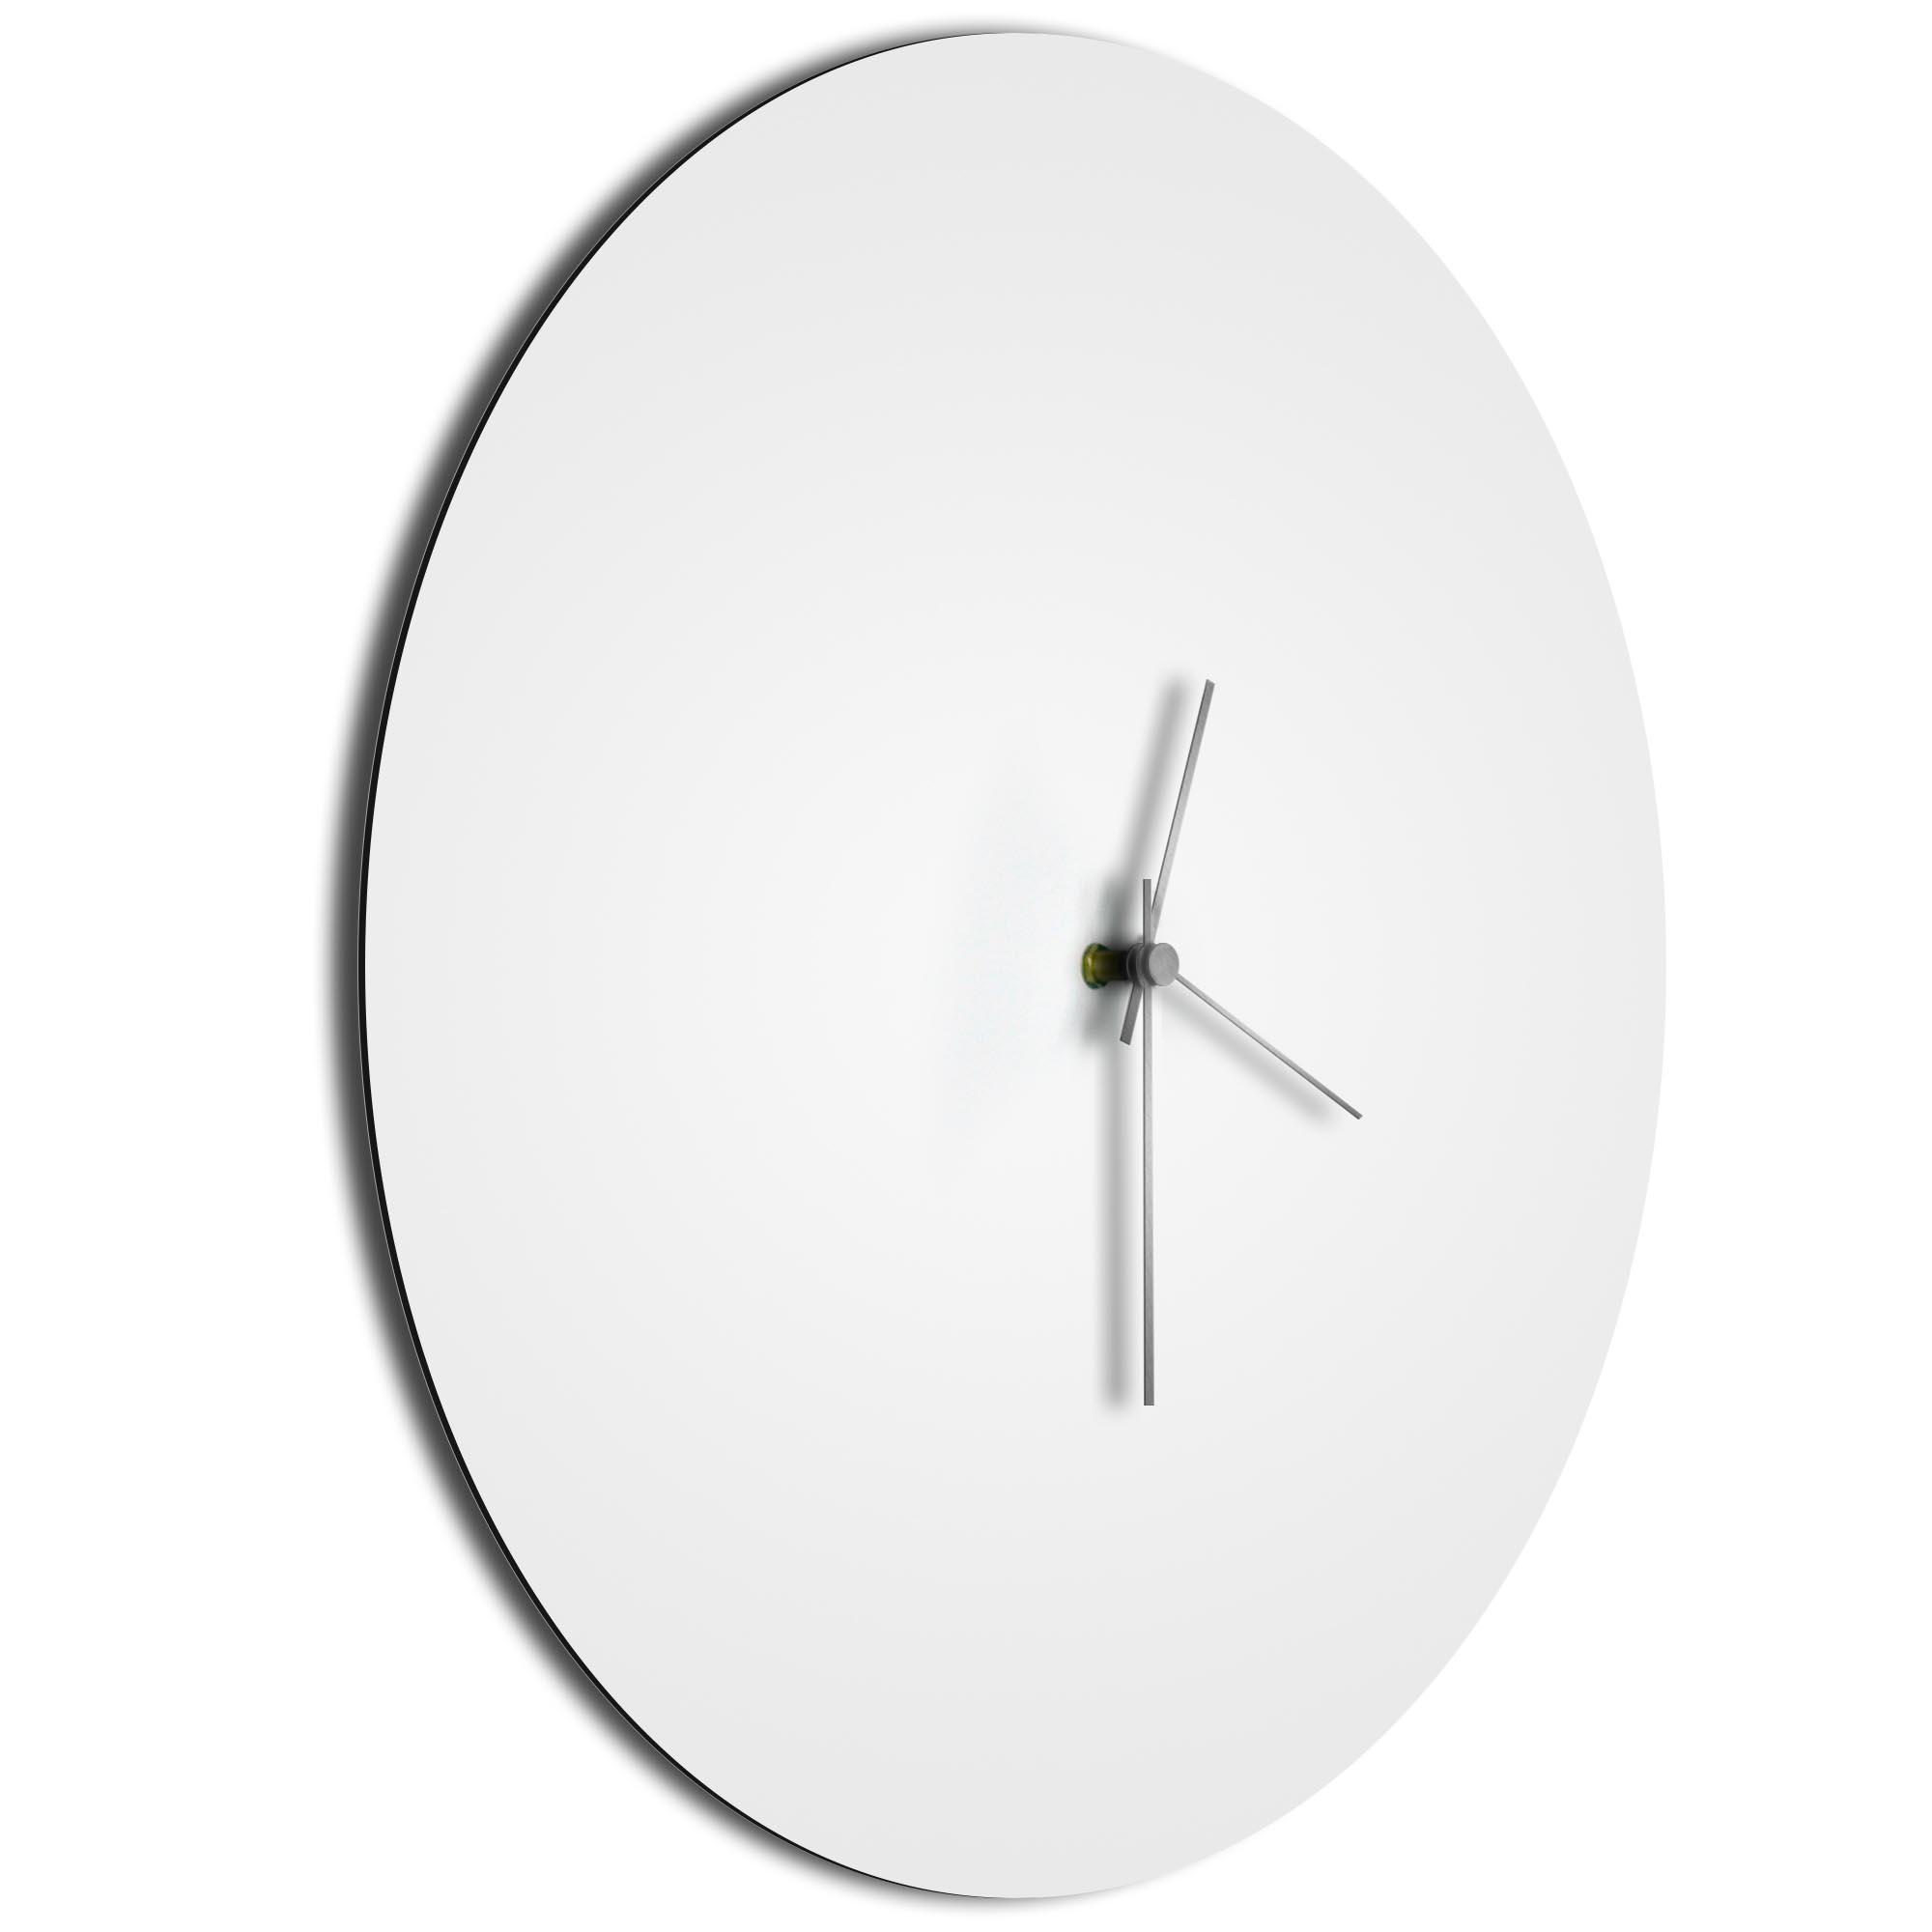 Whiteout Silver Circle Clock - Image 2